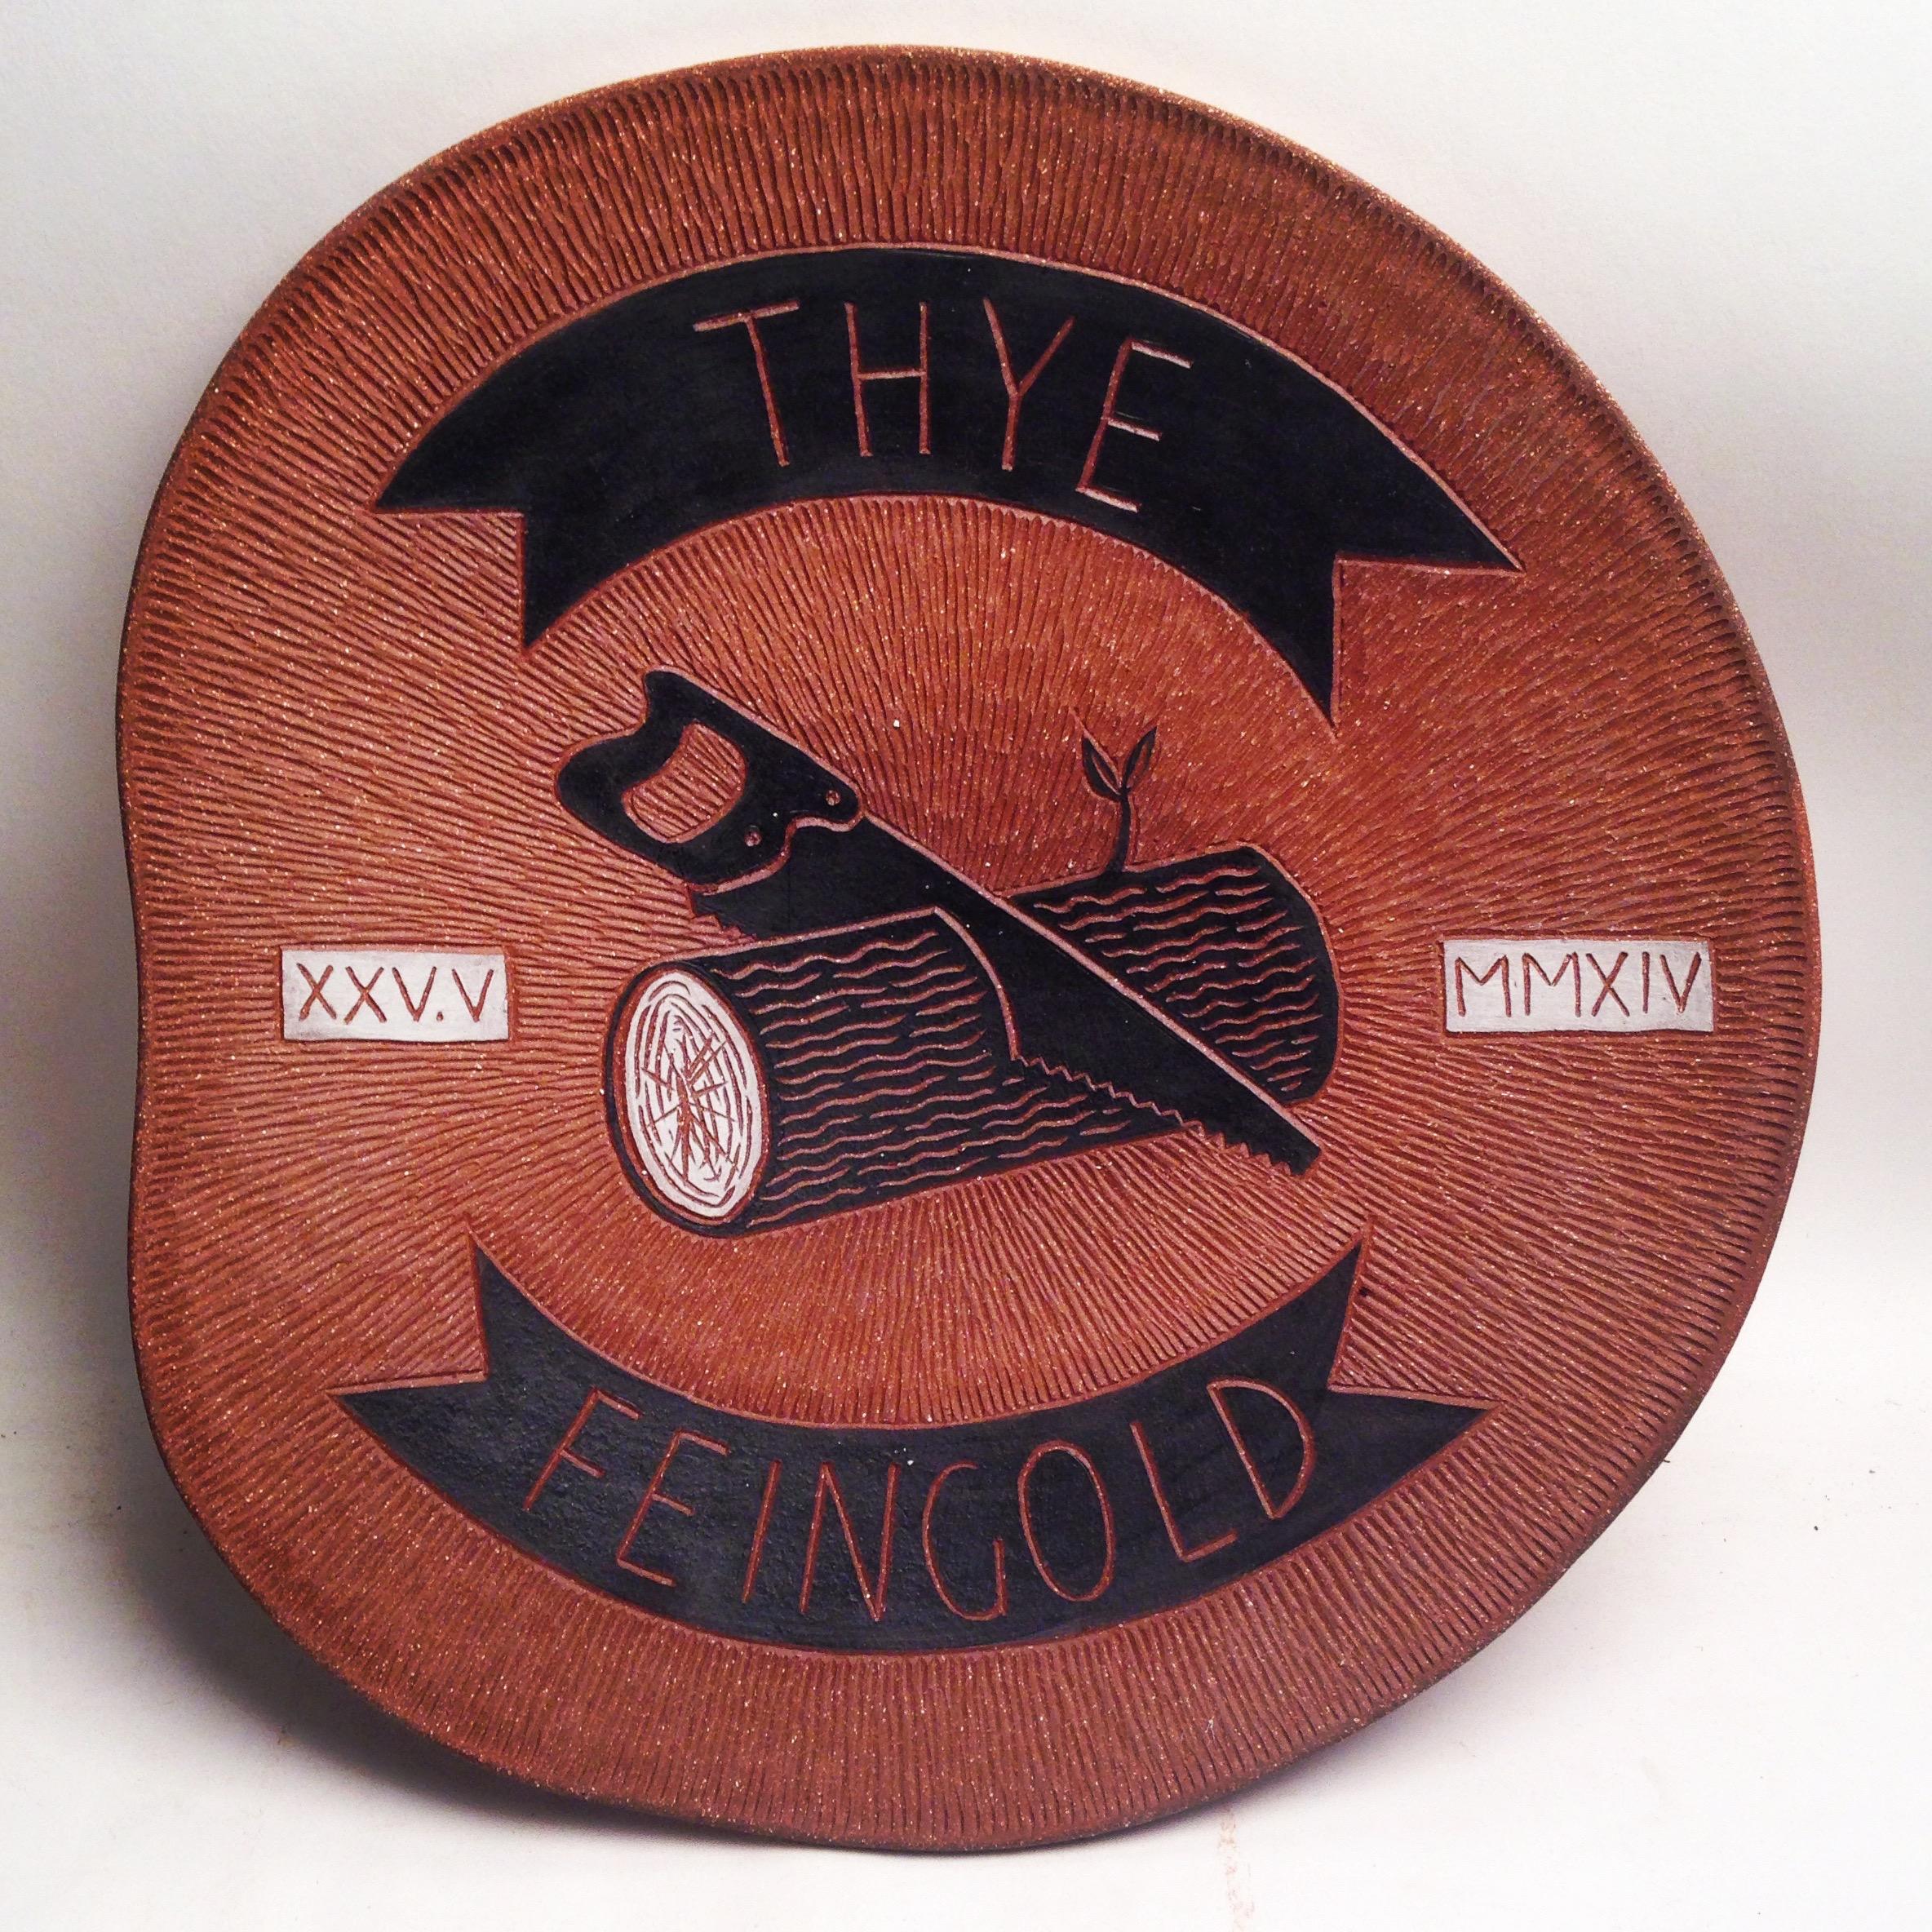 Thye Feingold wedding platter, 2014